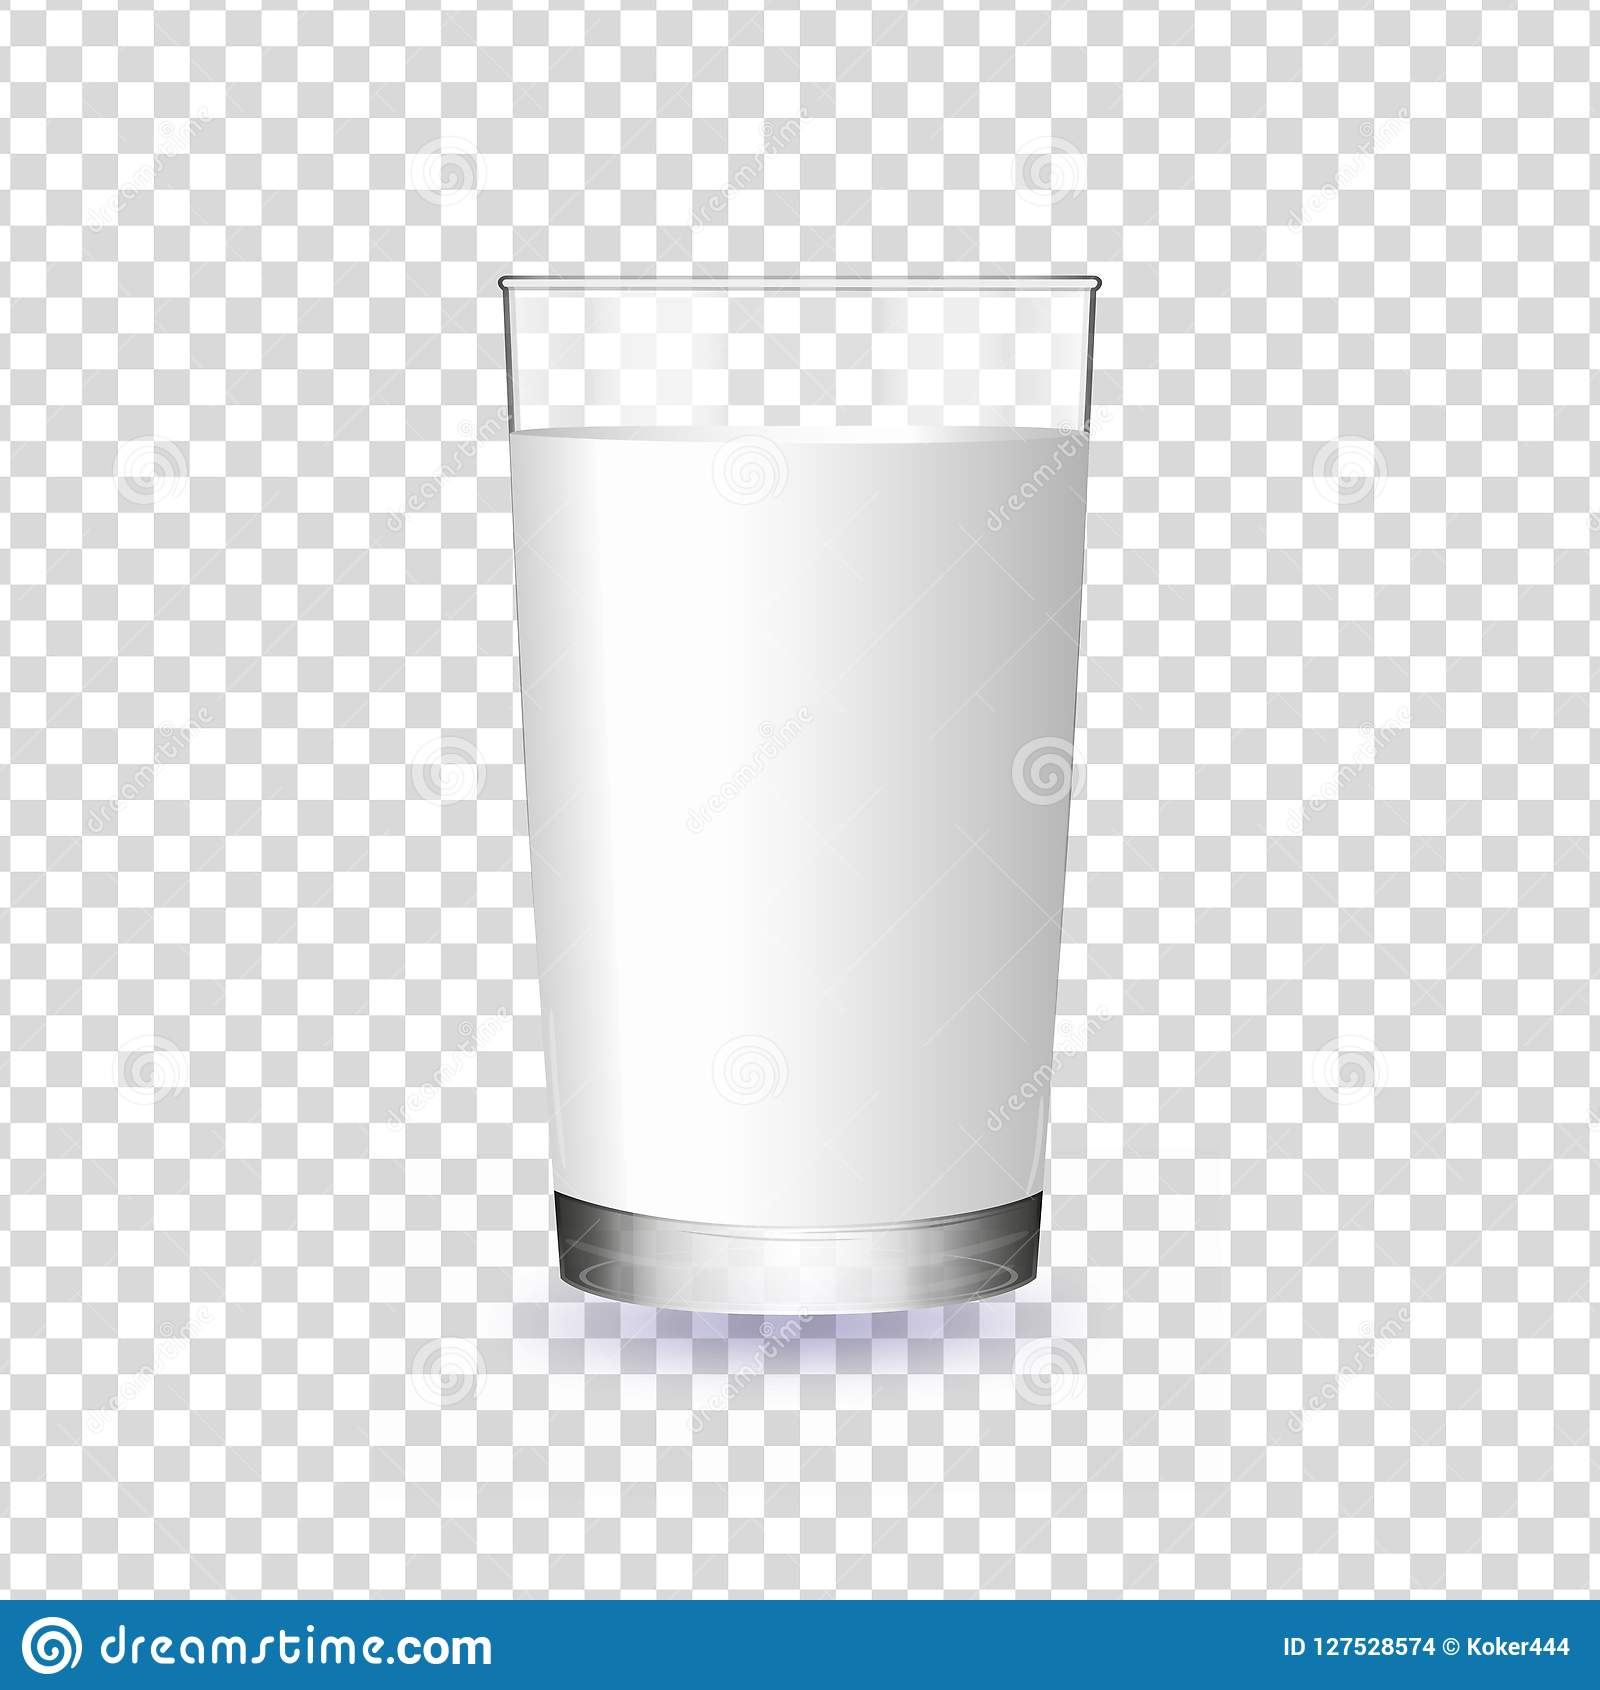 Glass Of Milk Transparent